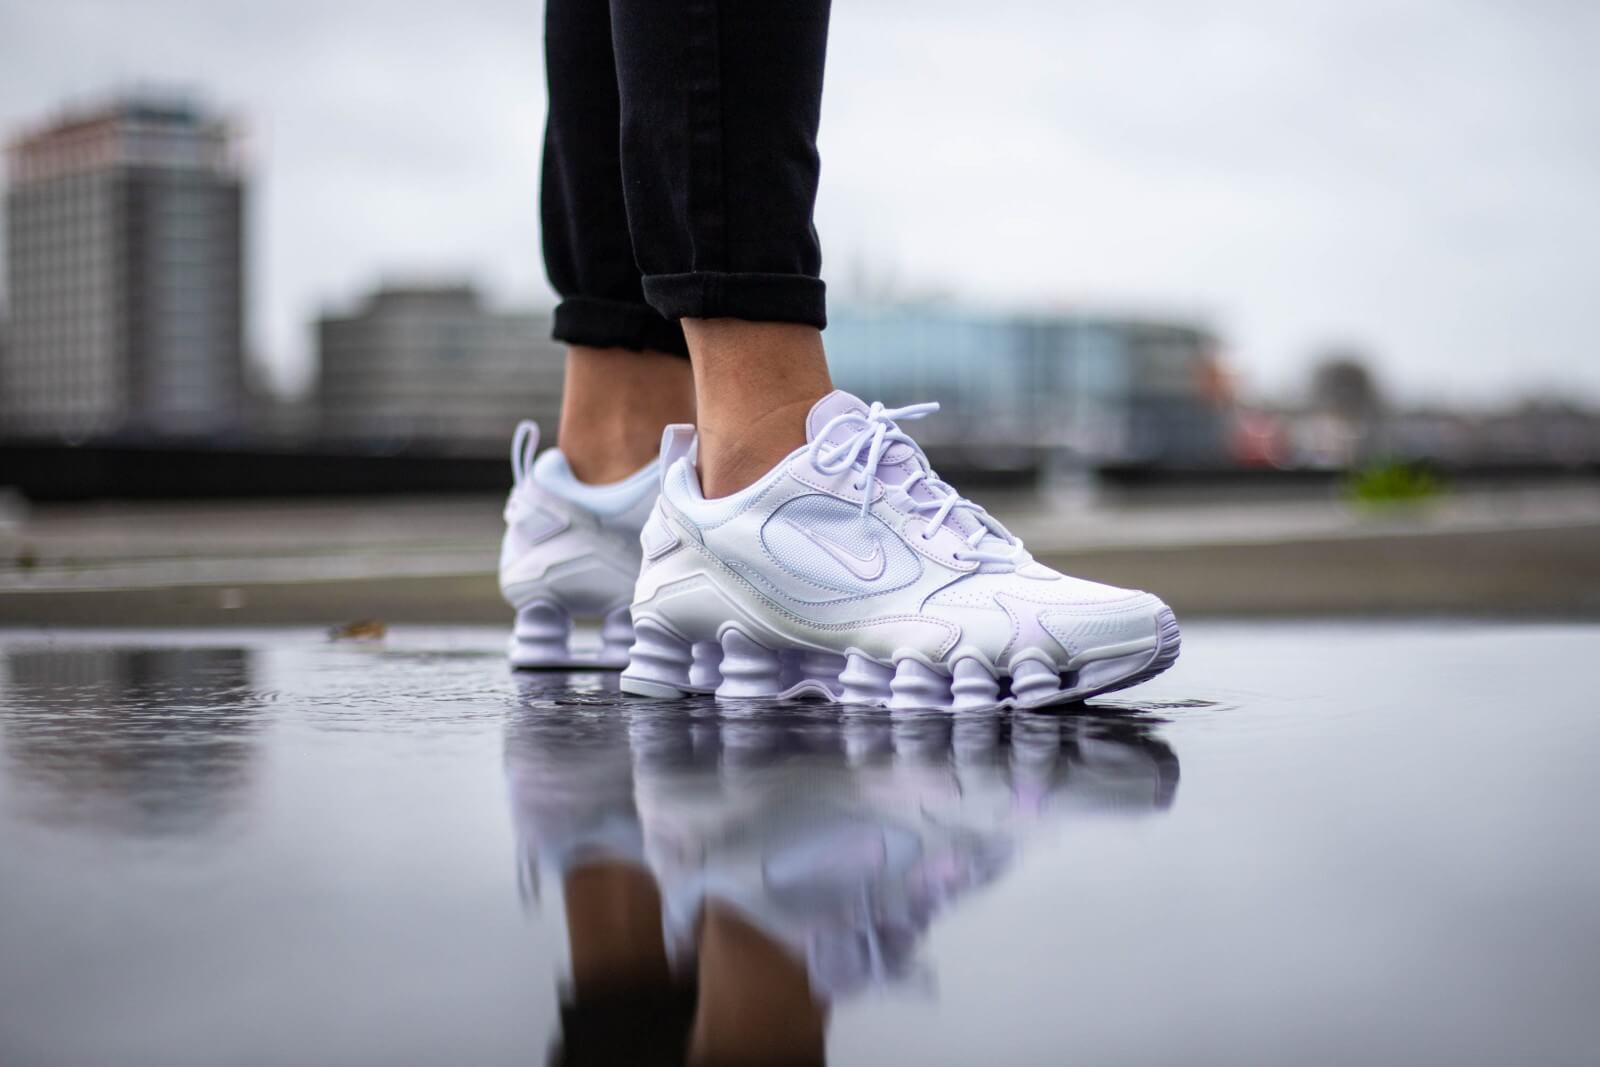 Nike Women's Shox TL Nova White/Barely Grape